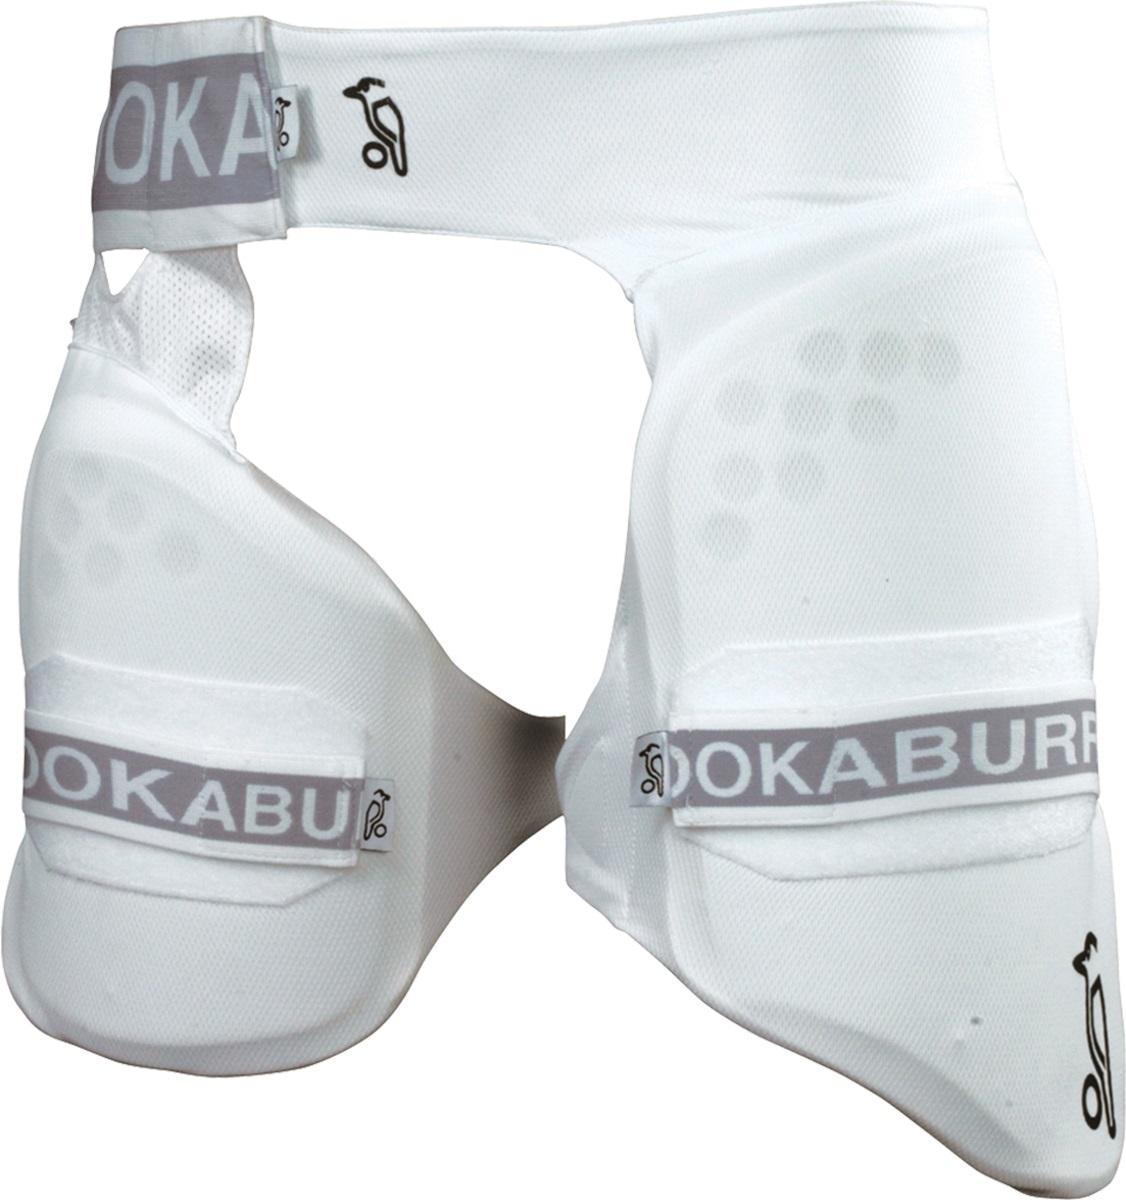 Kookaburra Cricket 1000 Abdo Guard Shock Absorbent Box ABS Padded Shell ***New